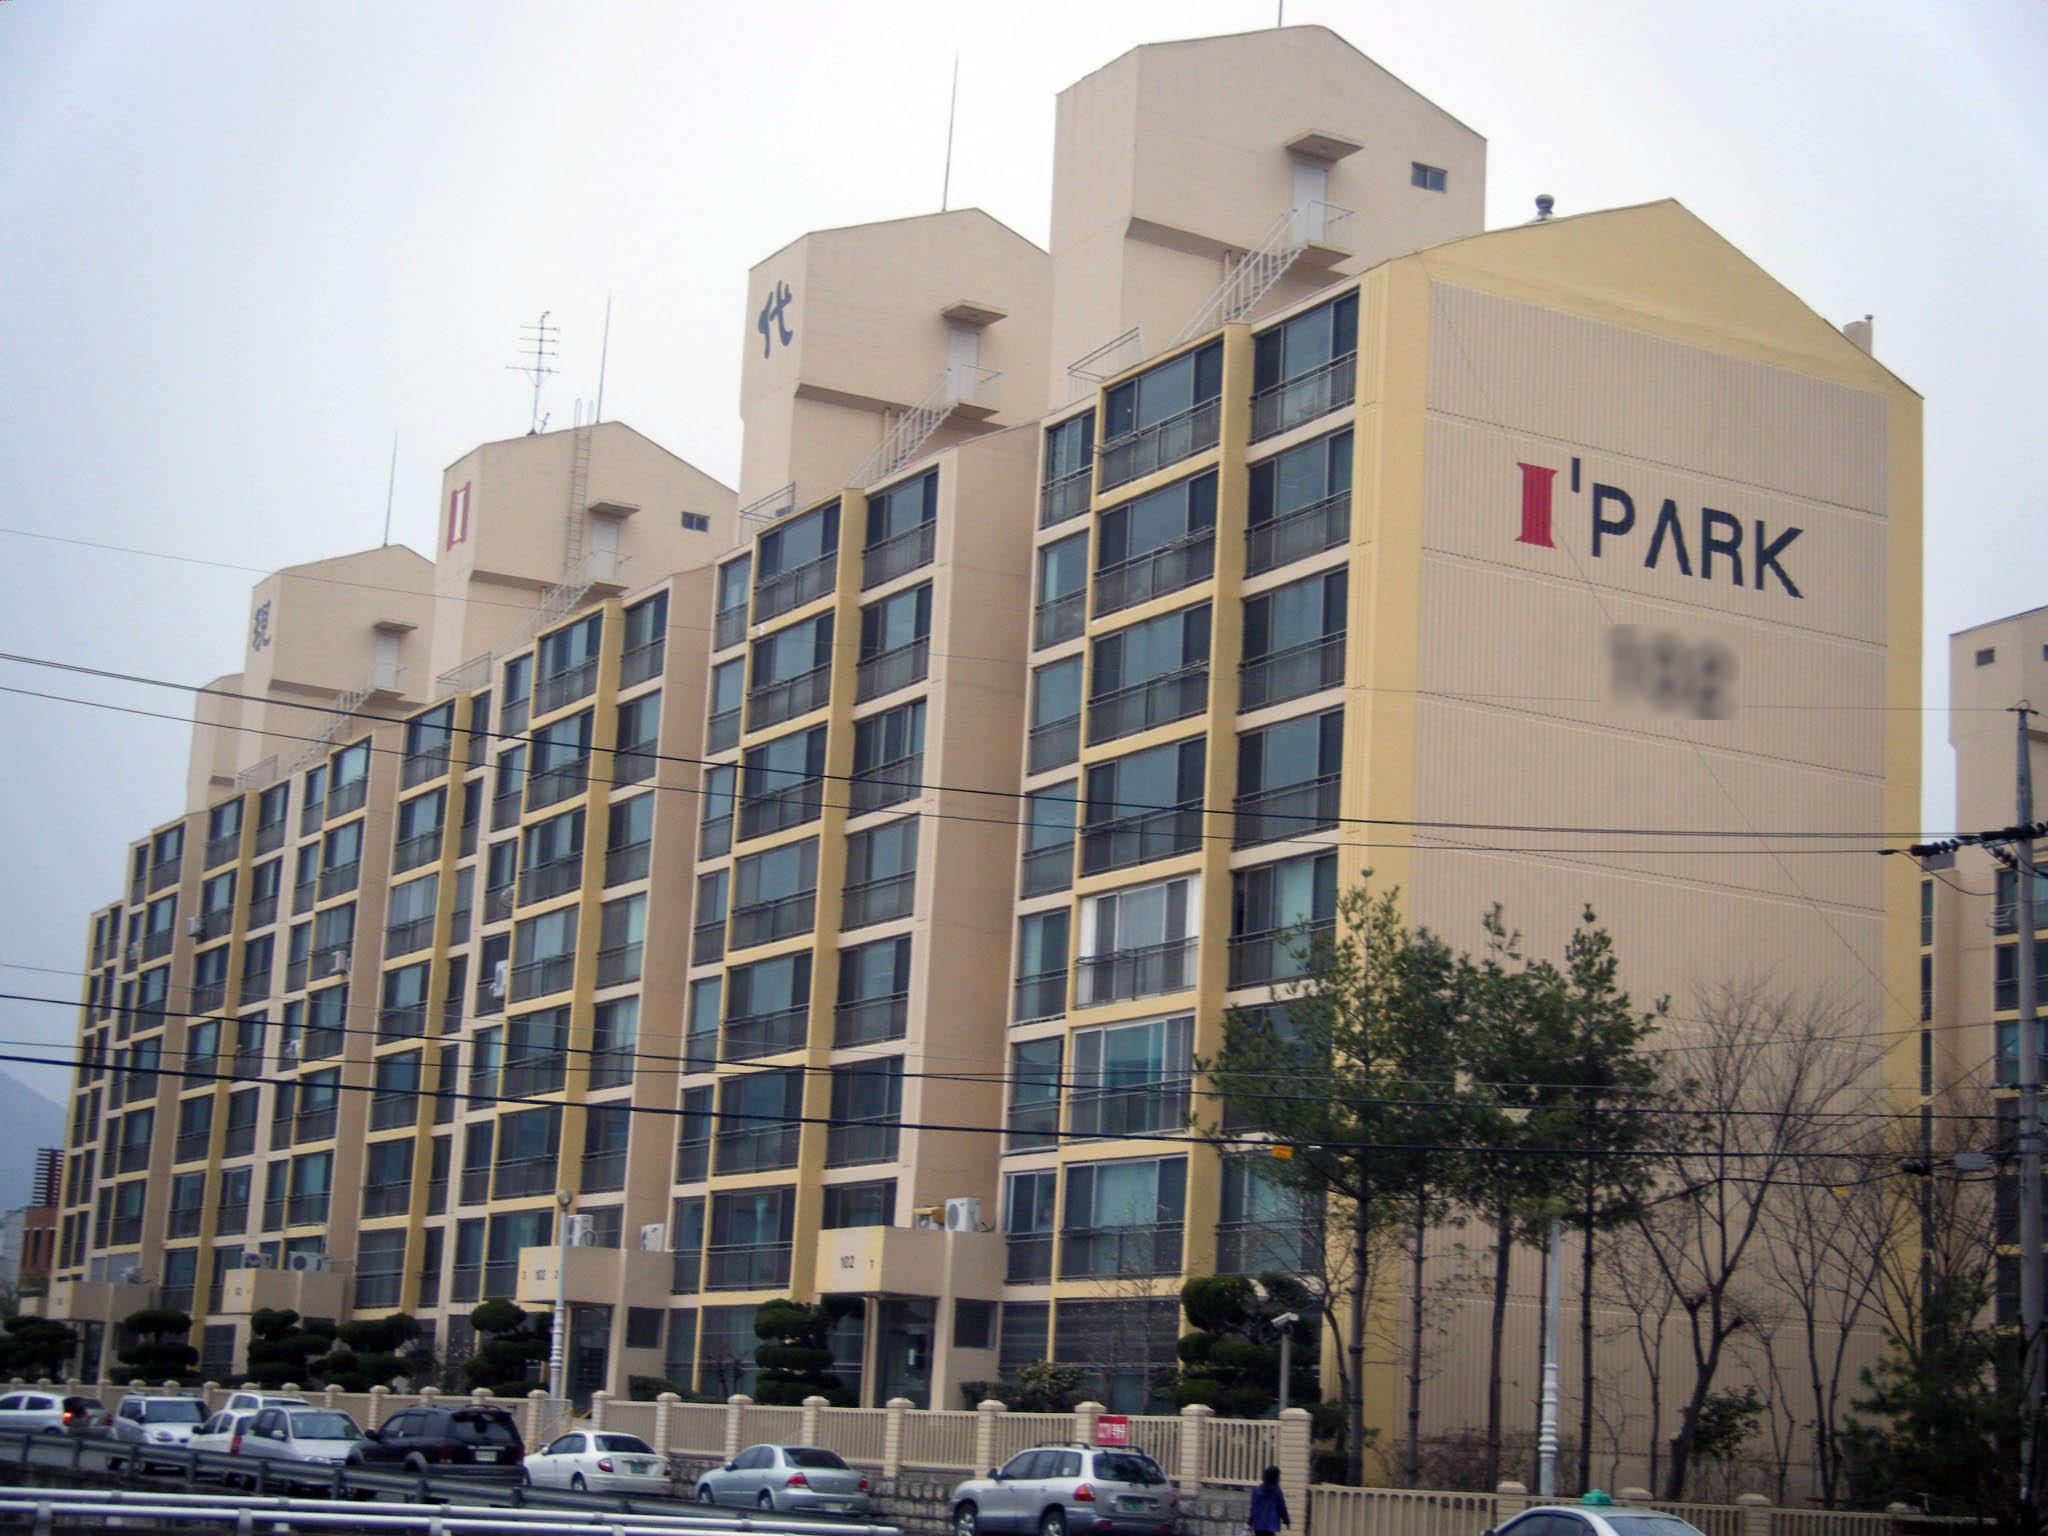 K Apt Building For Sale Chicago Area